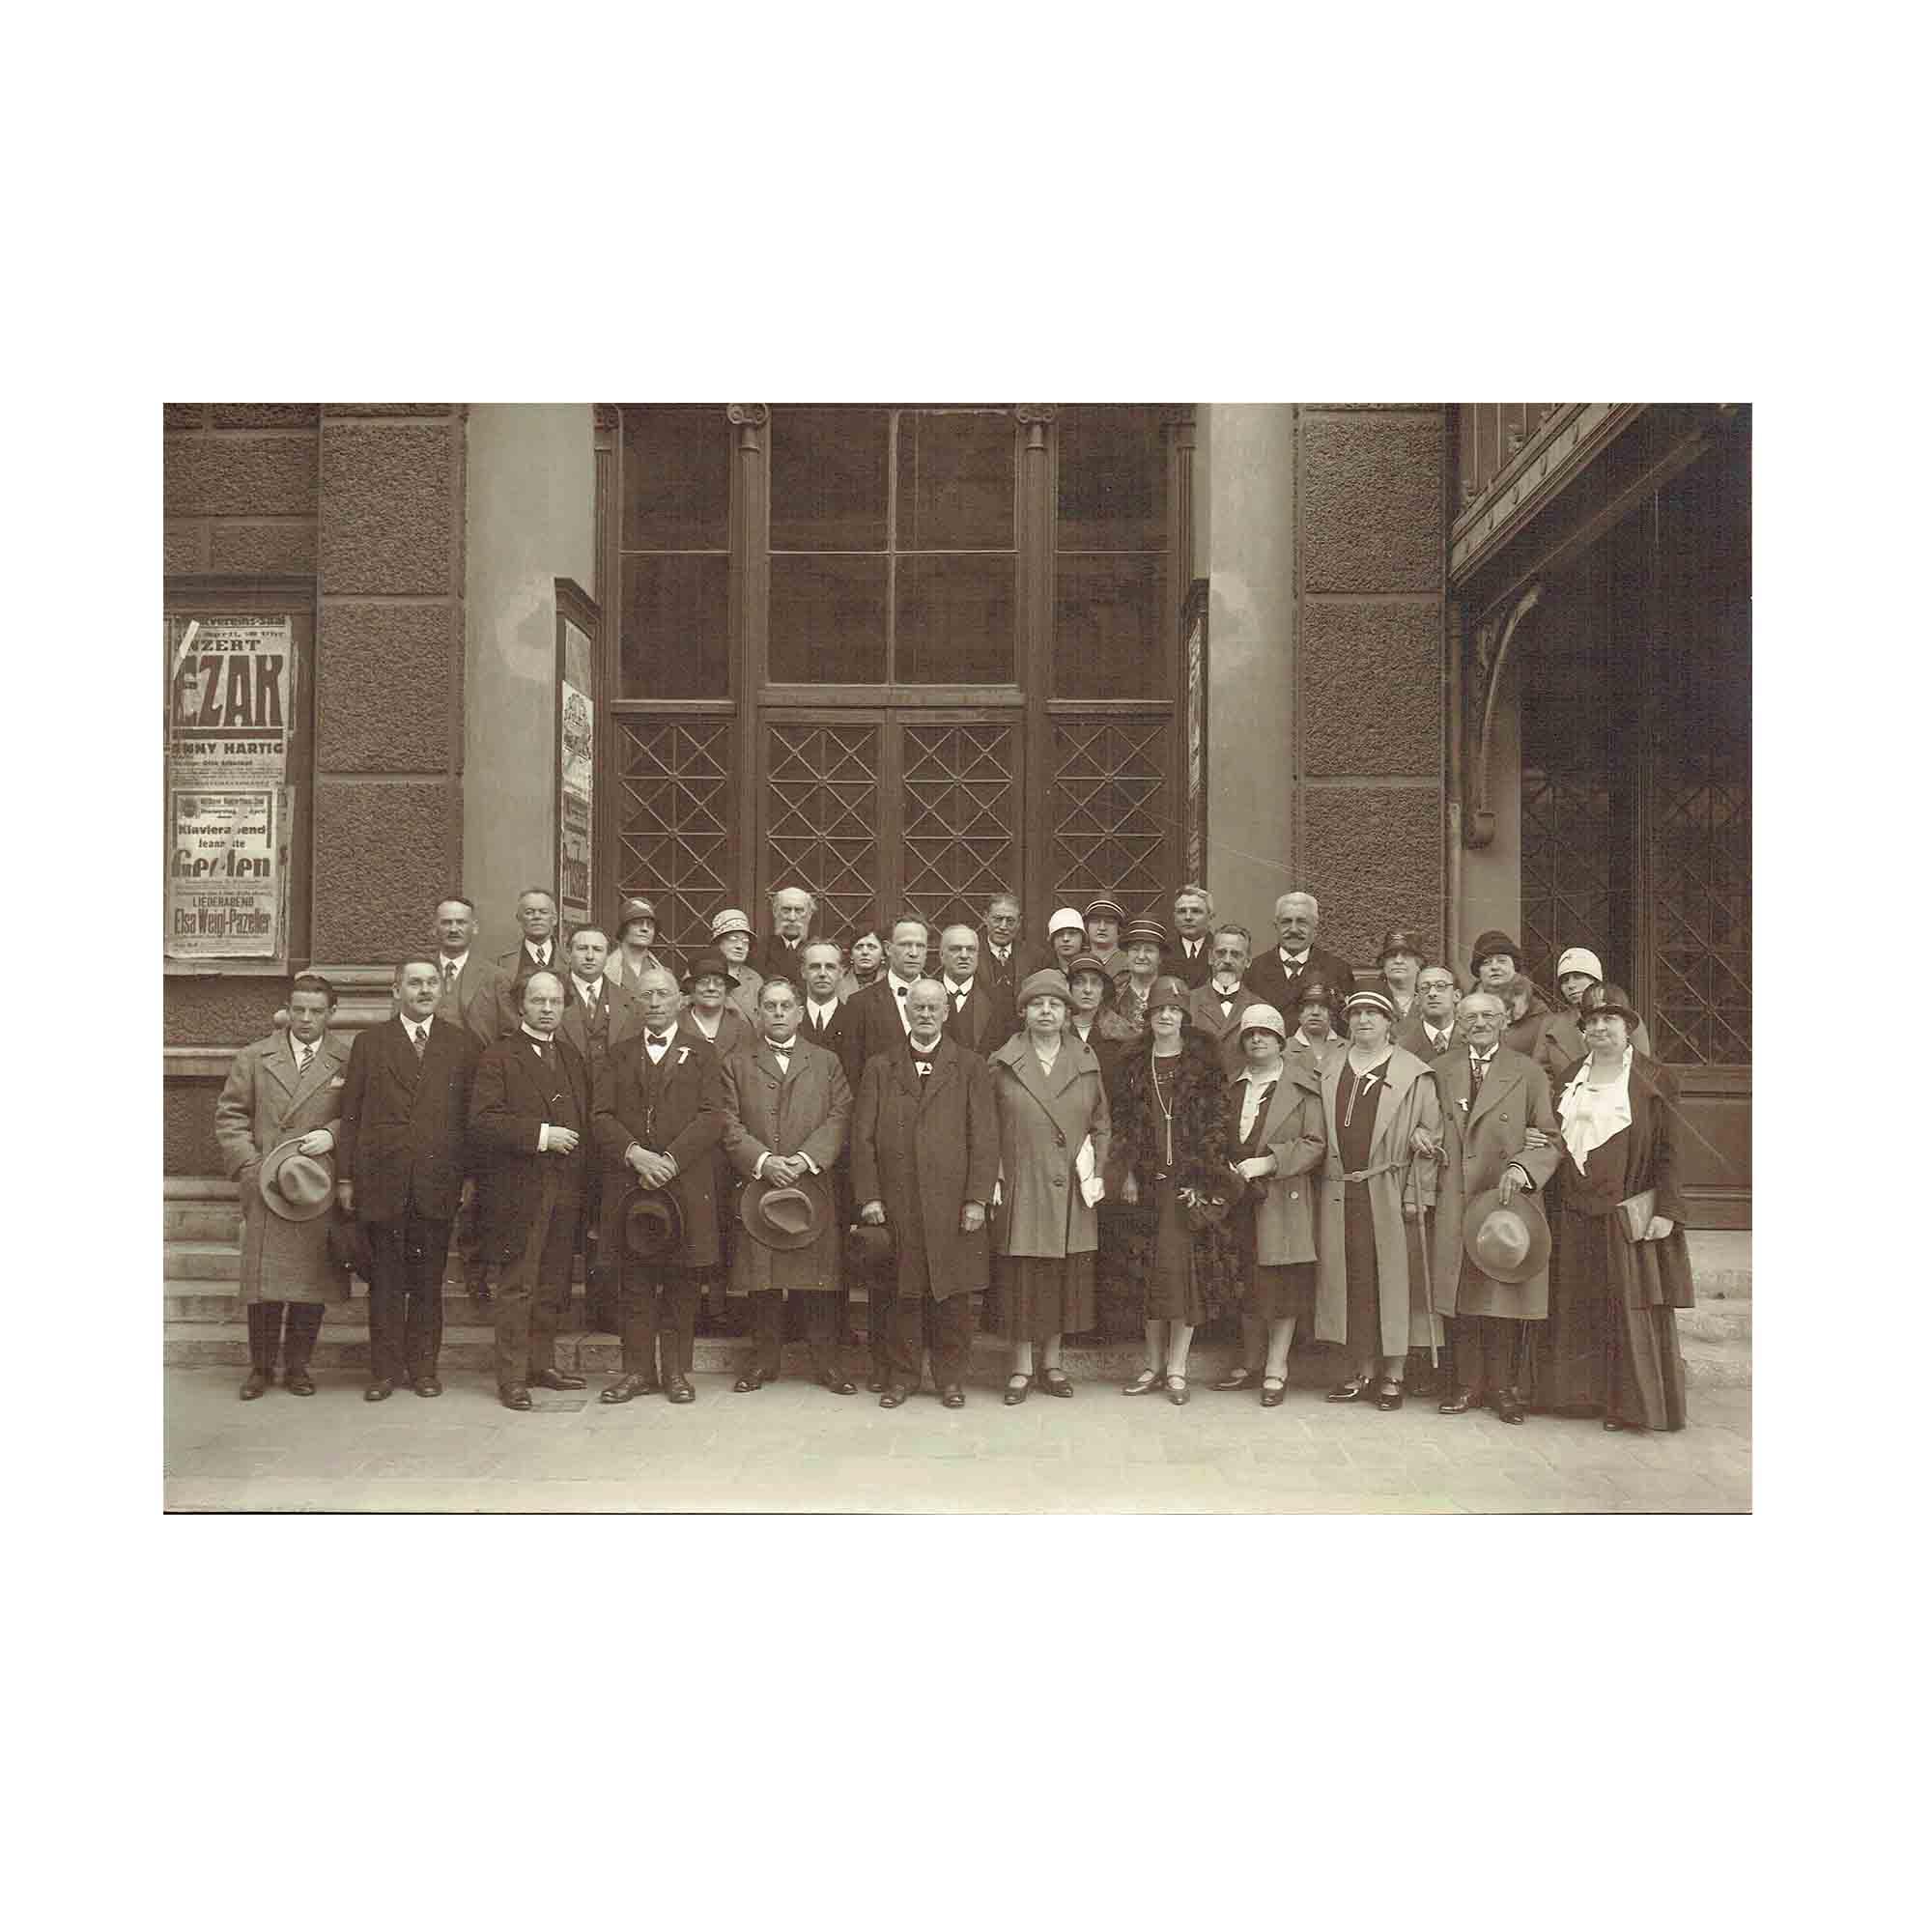 5449-Foto-Musikverein-Portal-Gruppe-um-1920-N.jpg